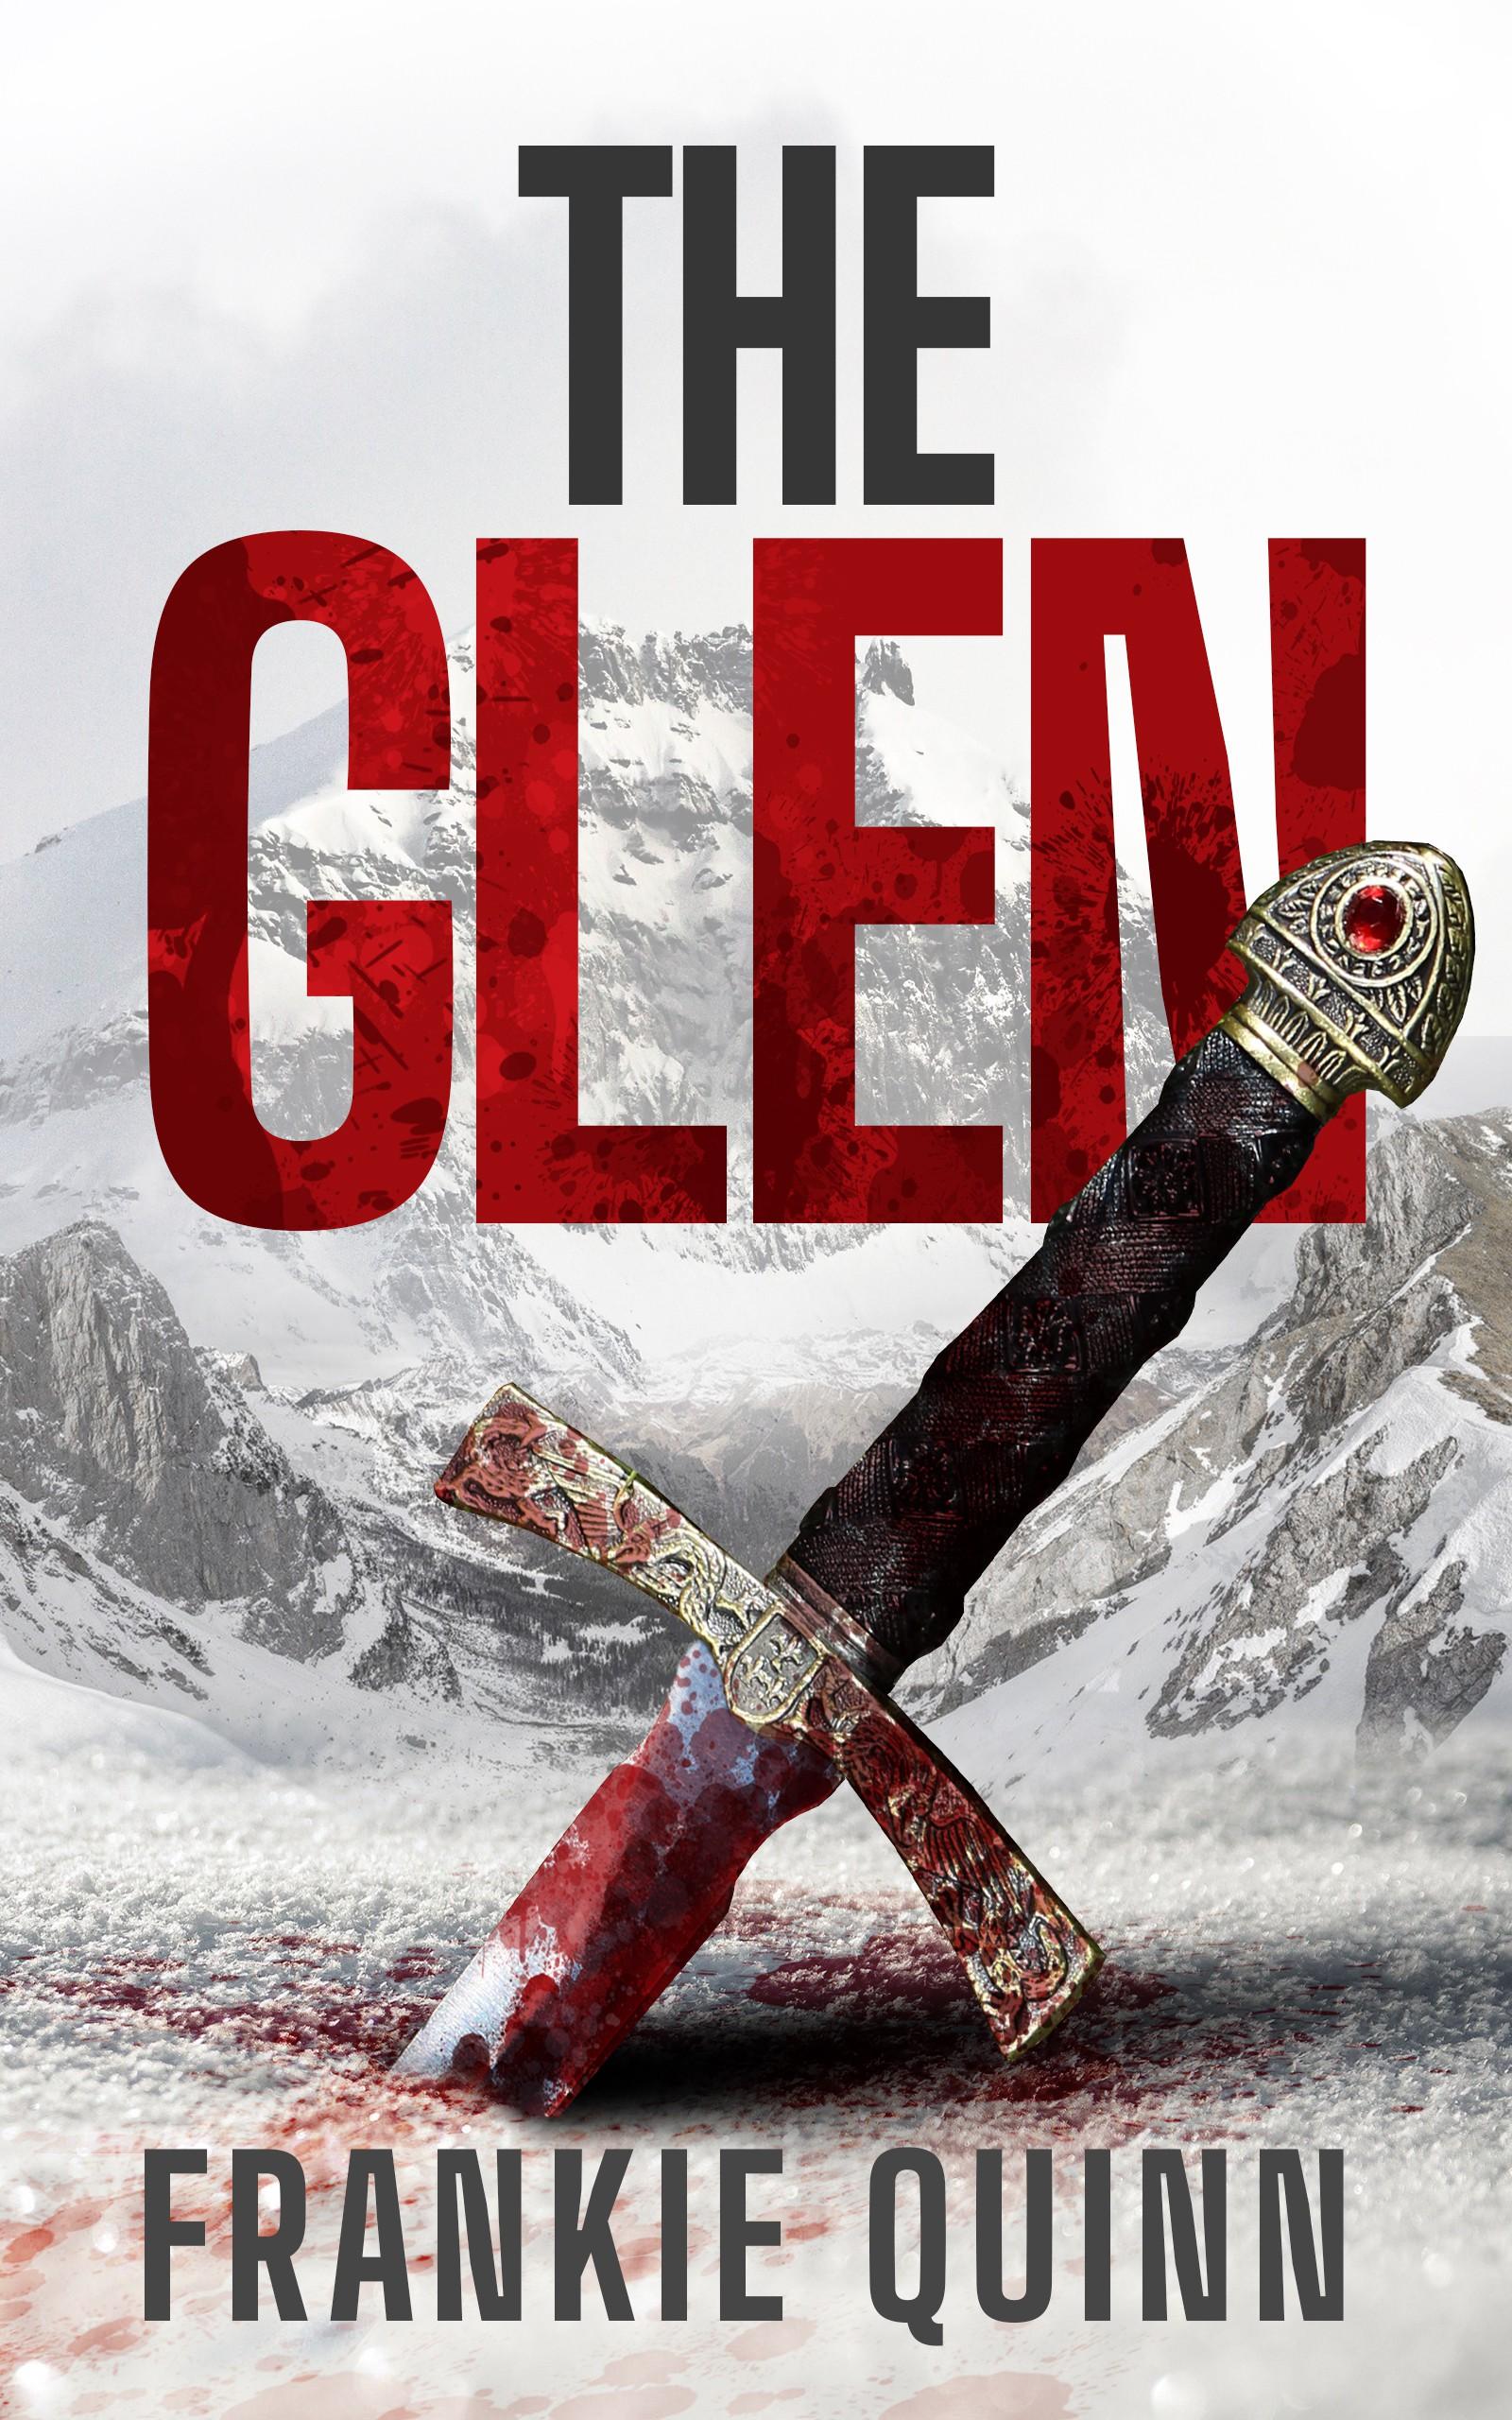 Atmospheric design for Scottish historical fiction e-book cover